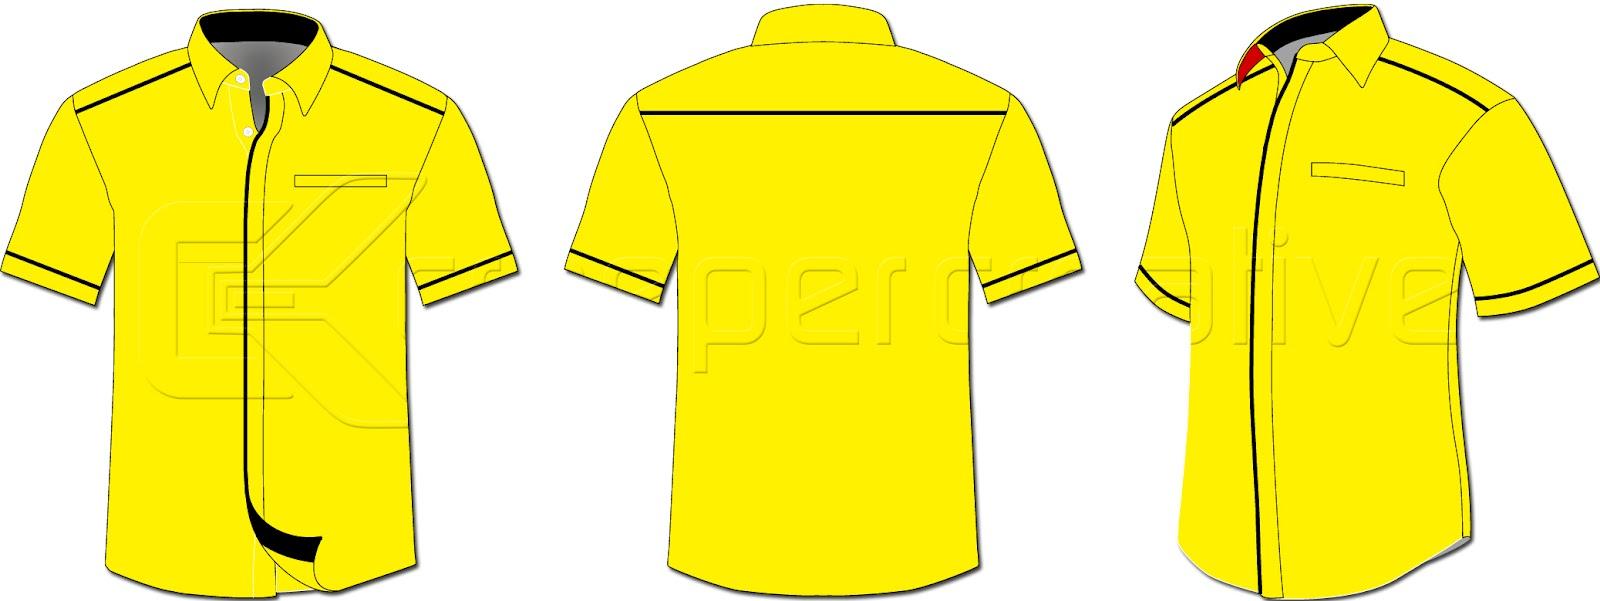 kemeja korporat f1 shirt kemeja f1 corporate shirt baju f1 baju ...